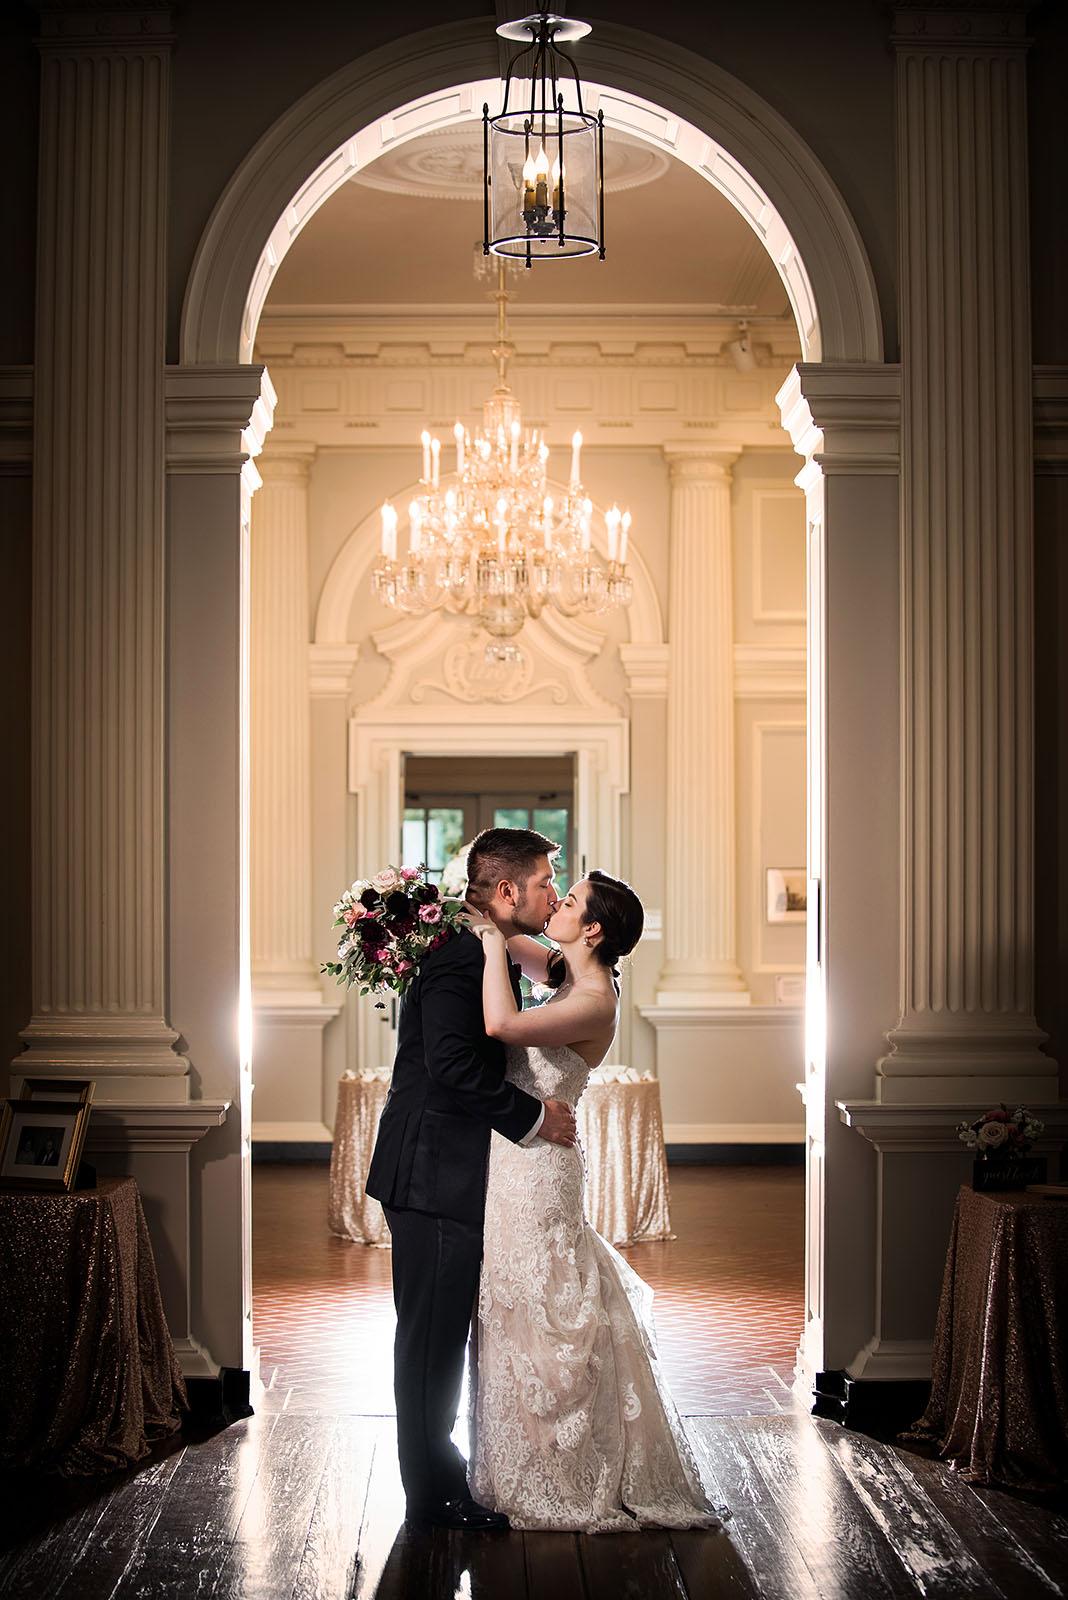 Bride Groom Chicago History Museum Wedding Photo Portrait